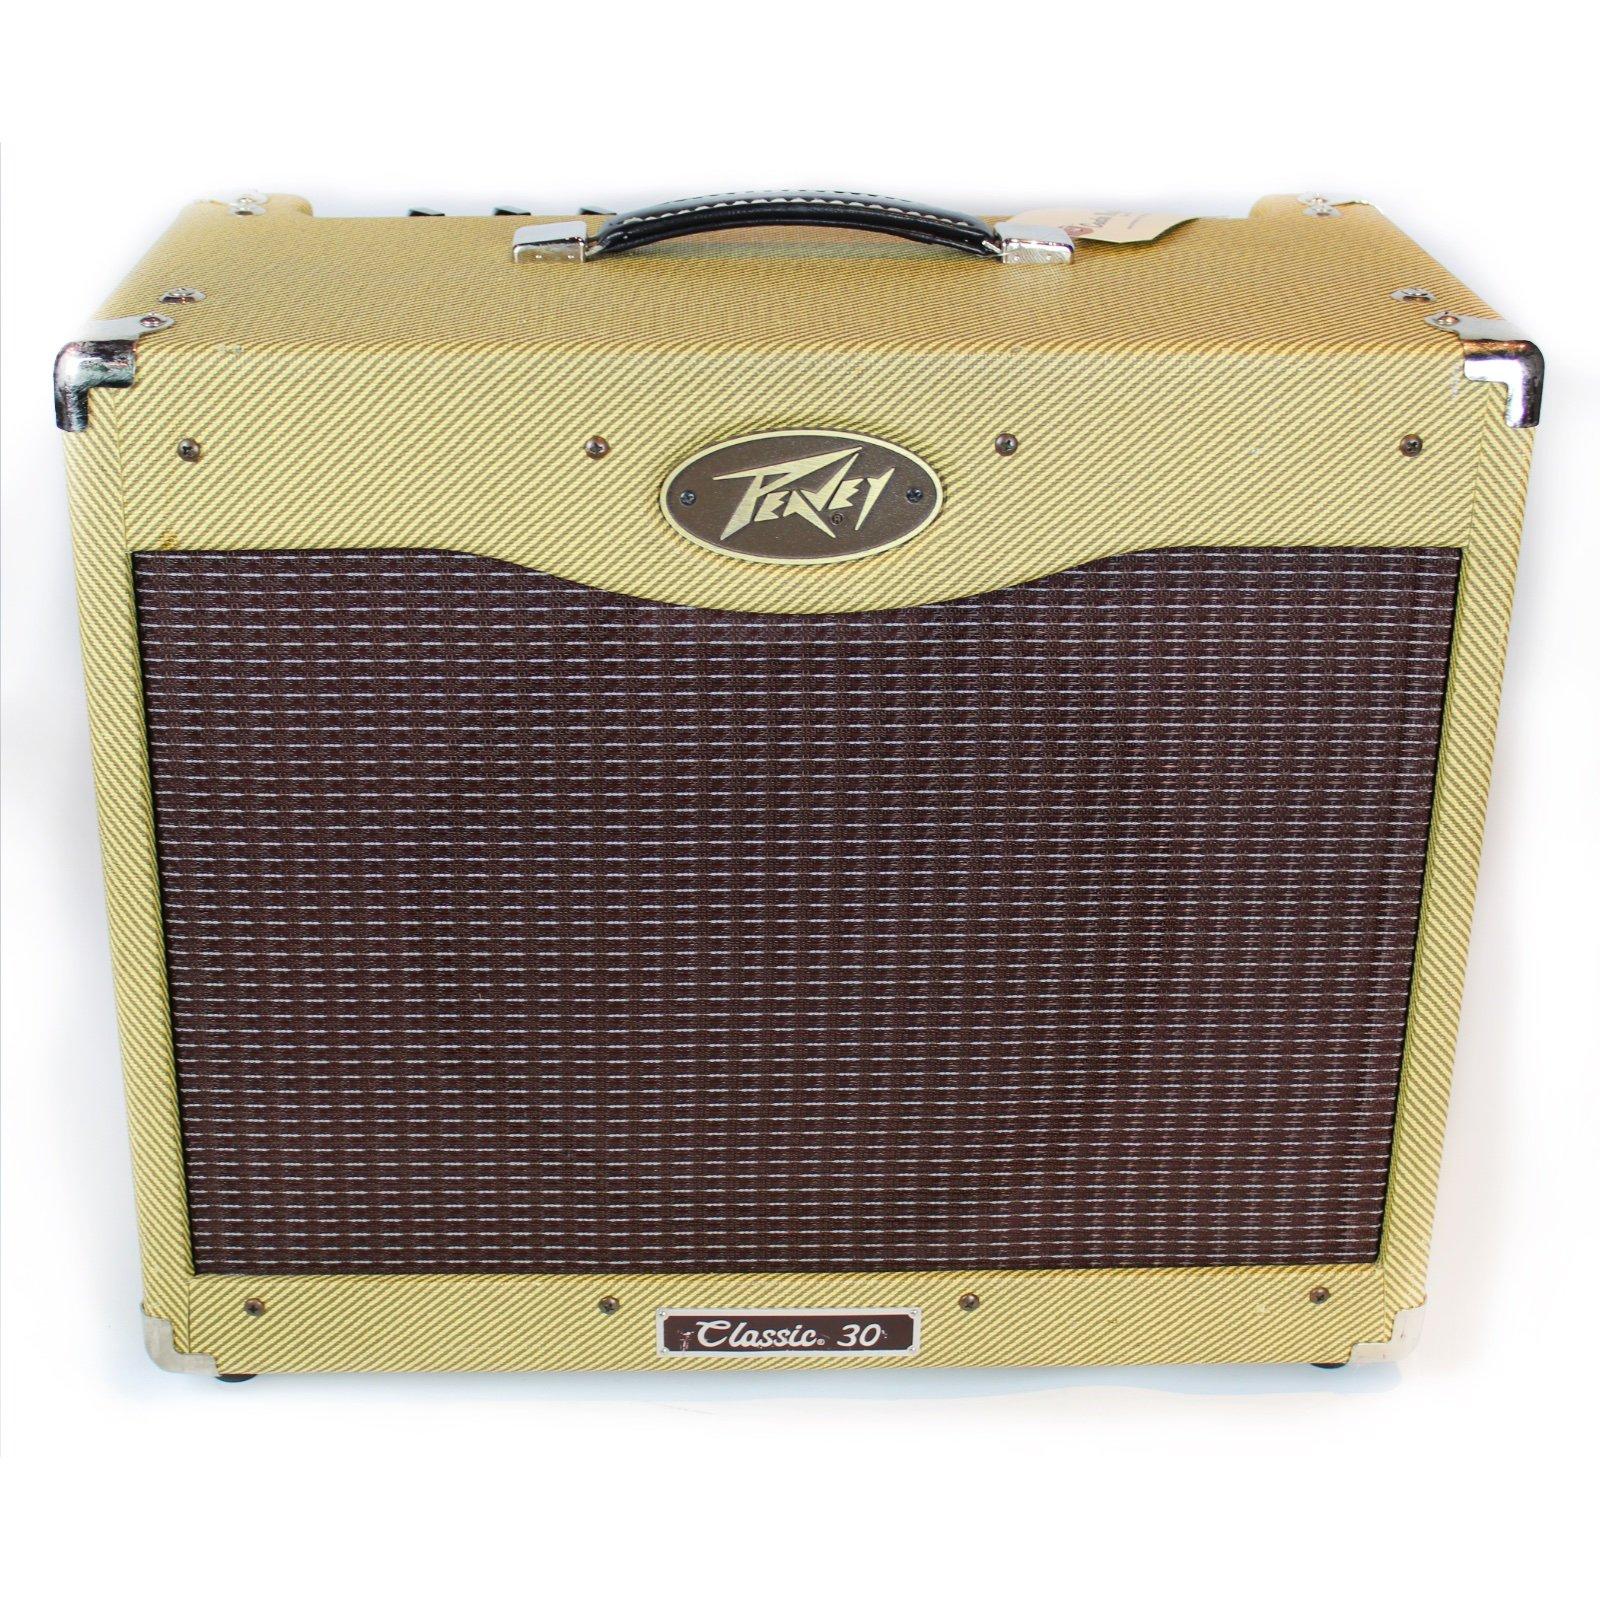 Peavey Classic 30 112 Guitar Combo Amp (USED)